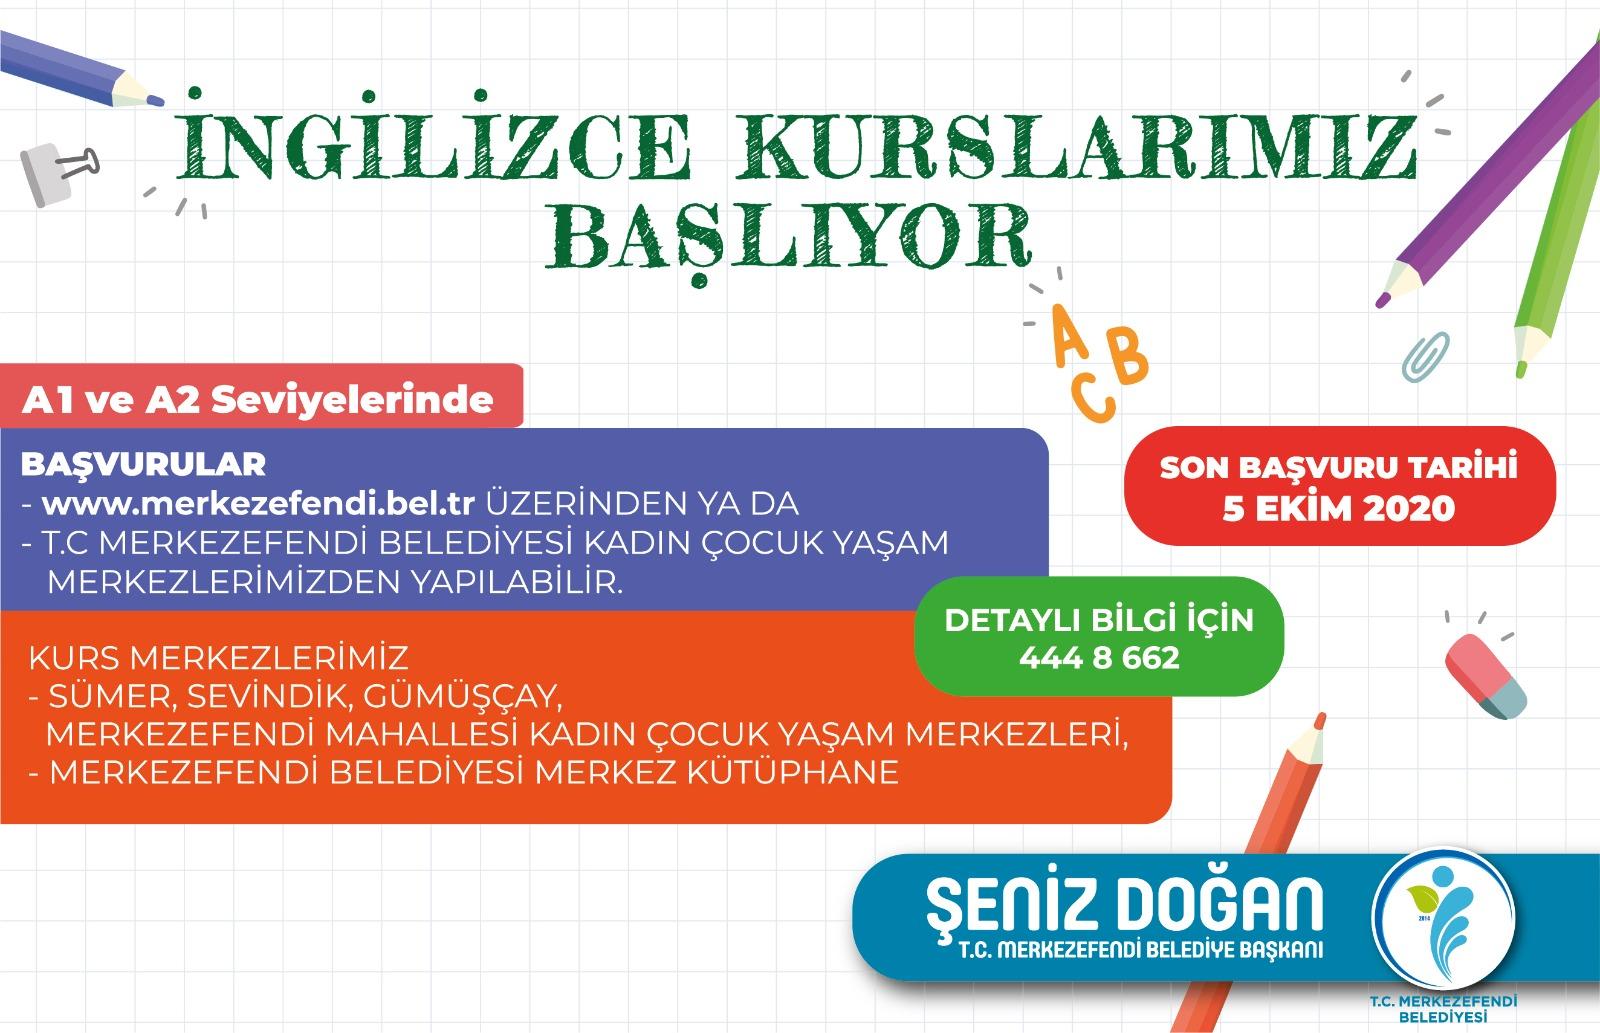 WhatsApp Image 2020 09 28 at 12.10.14 1 - MERKEZEFENDİ'DE KURS KAYITLARI BAŞLADI